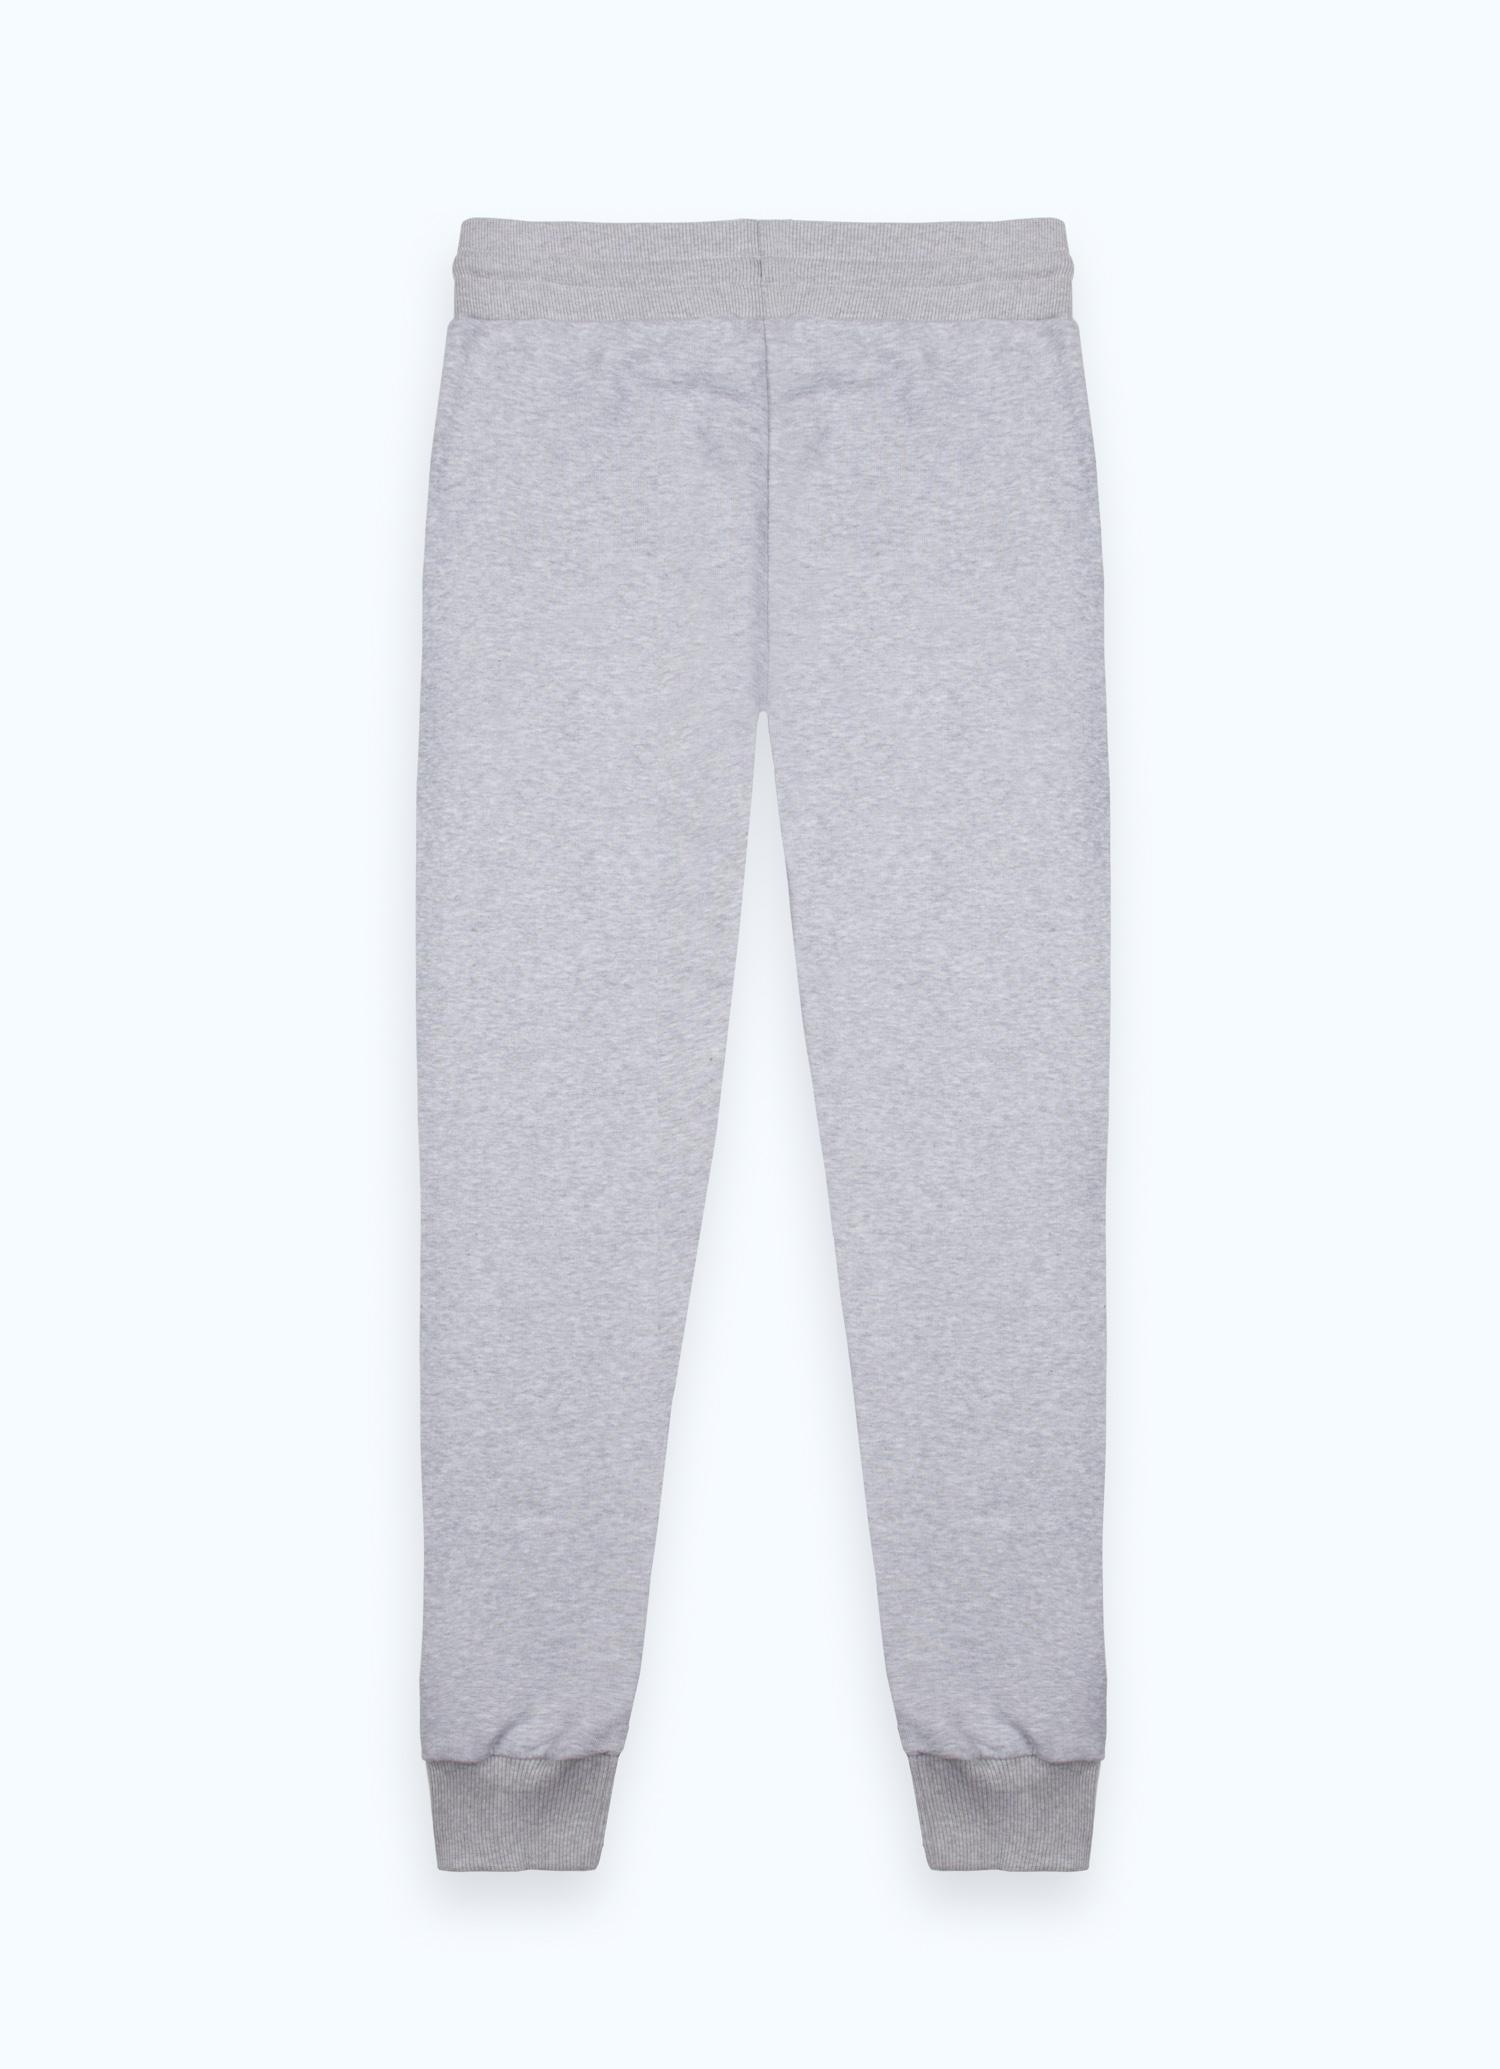 8e307ea8ed Colmar Originals women's fleece sweatpants - Colmar